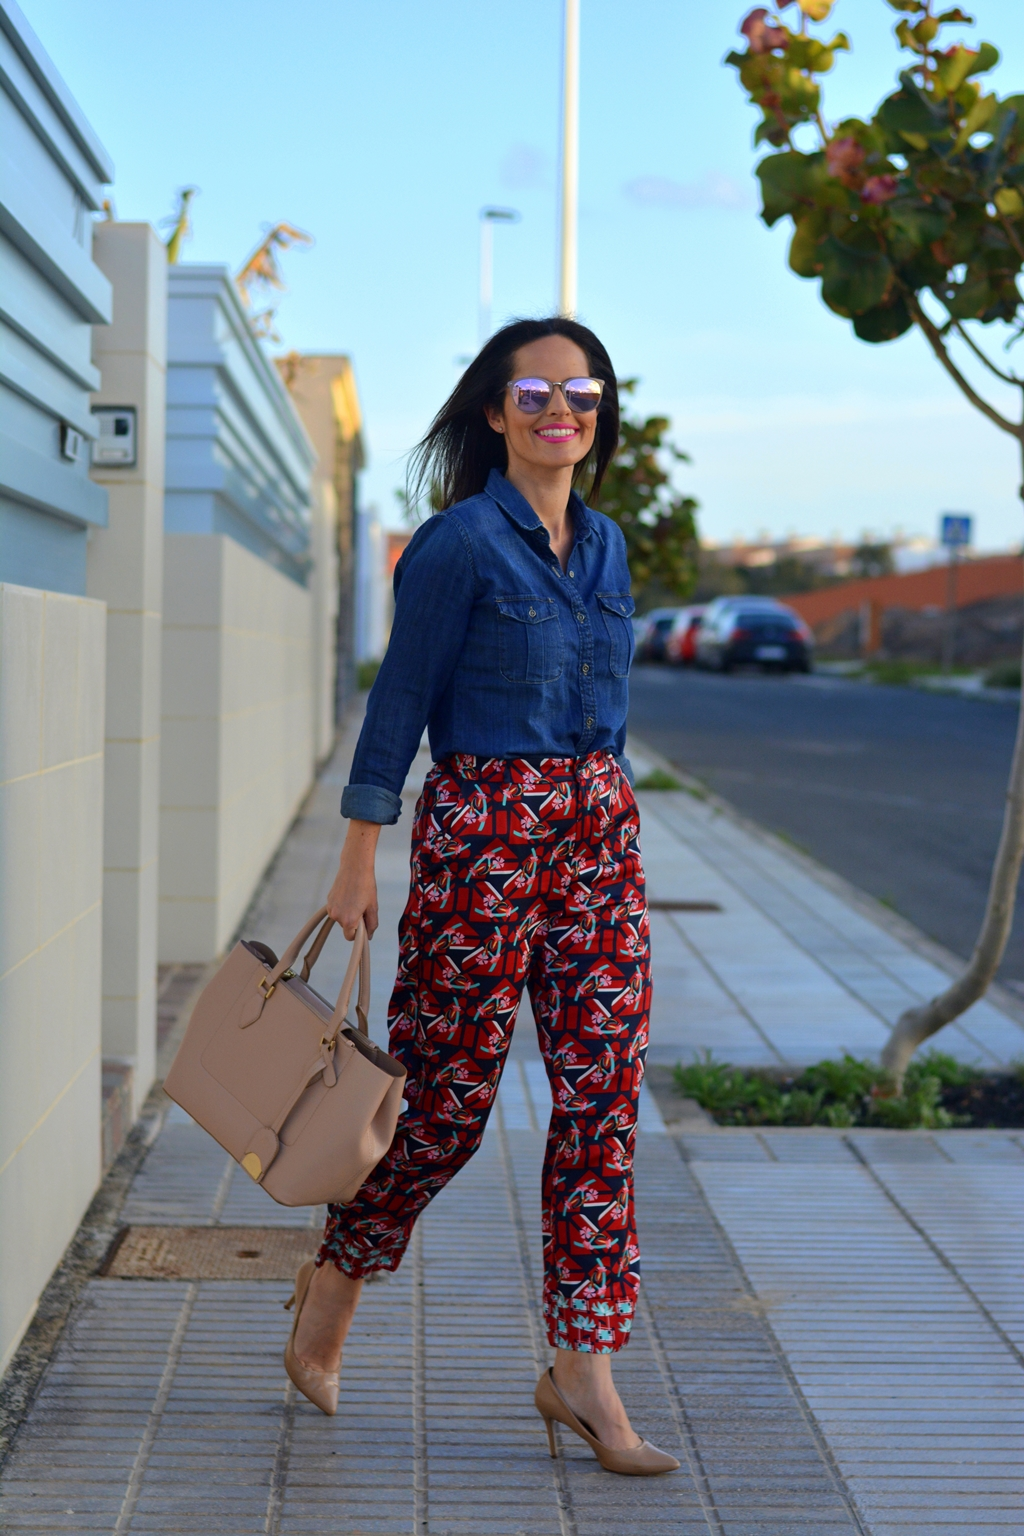 pyjama-pants-outfit-street-style